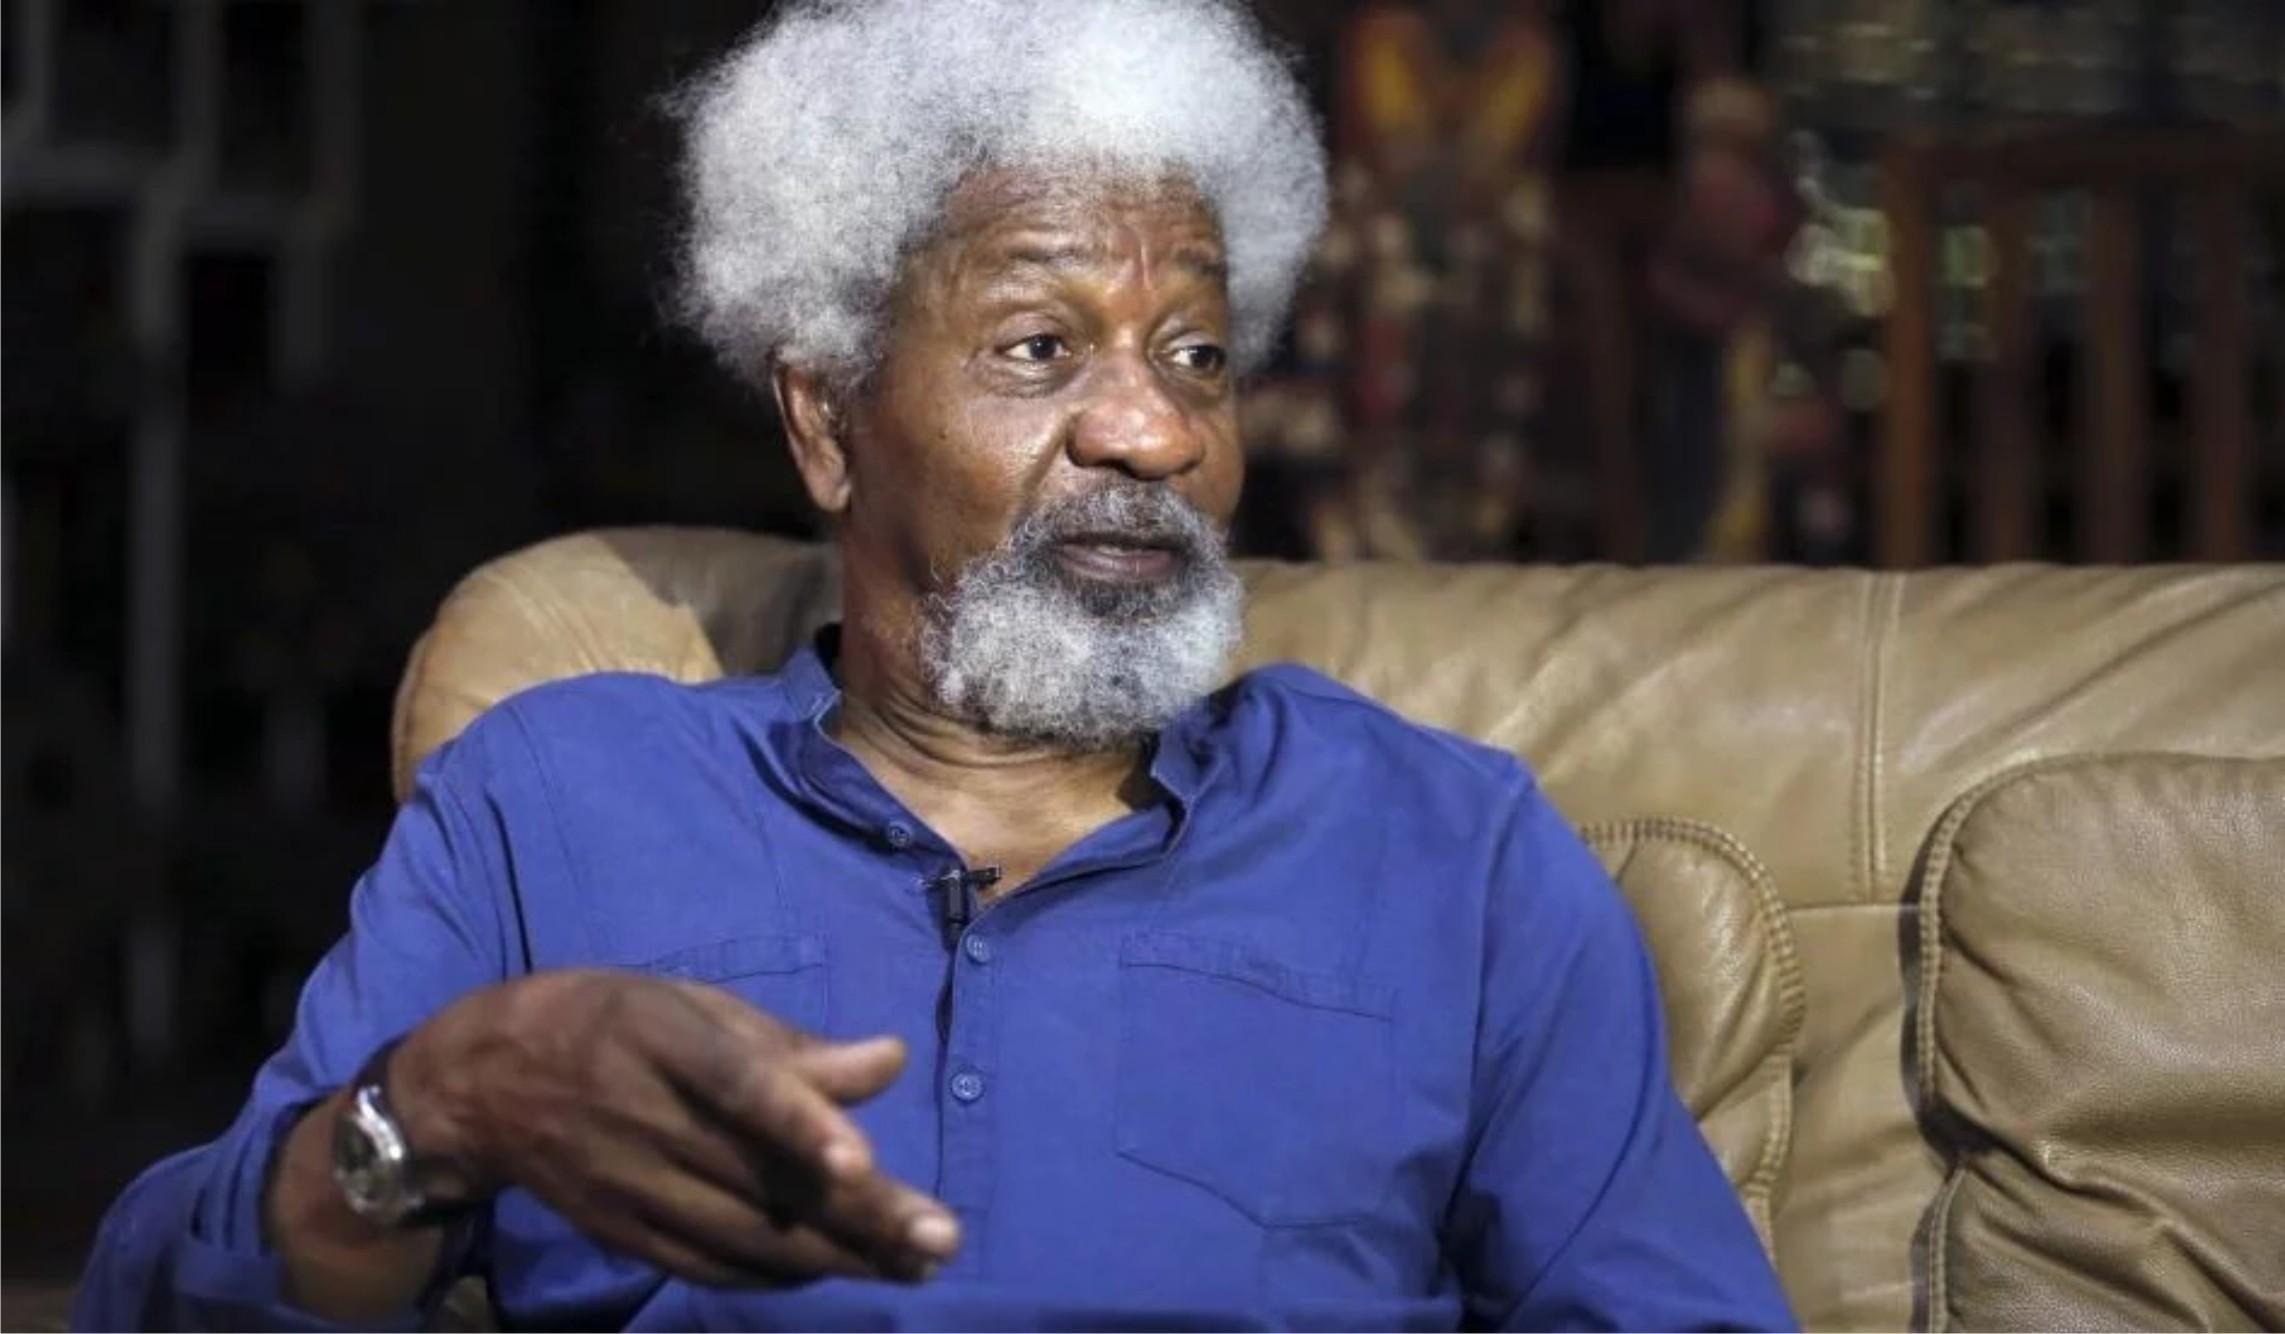 Soyinka compares Leah Sharibu to Mandela, blasts delayed US terror designation of Boko Haram